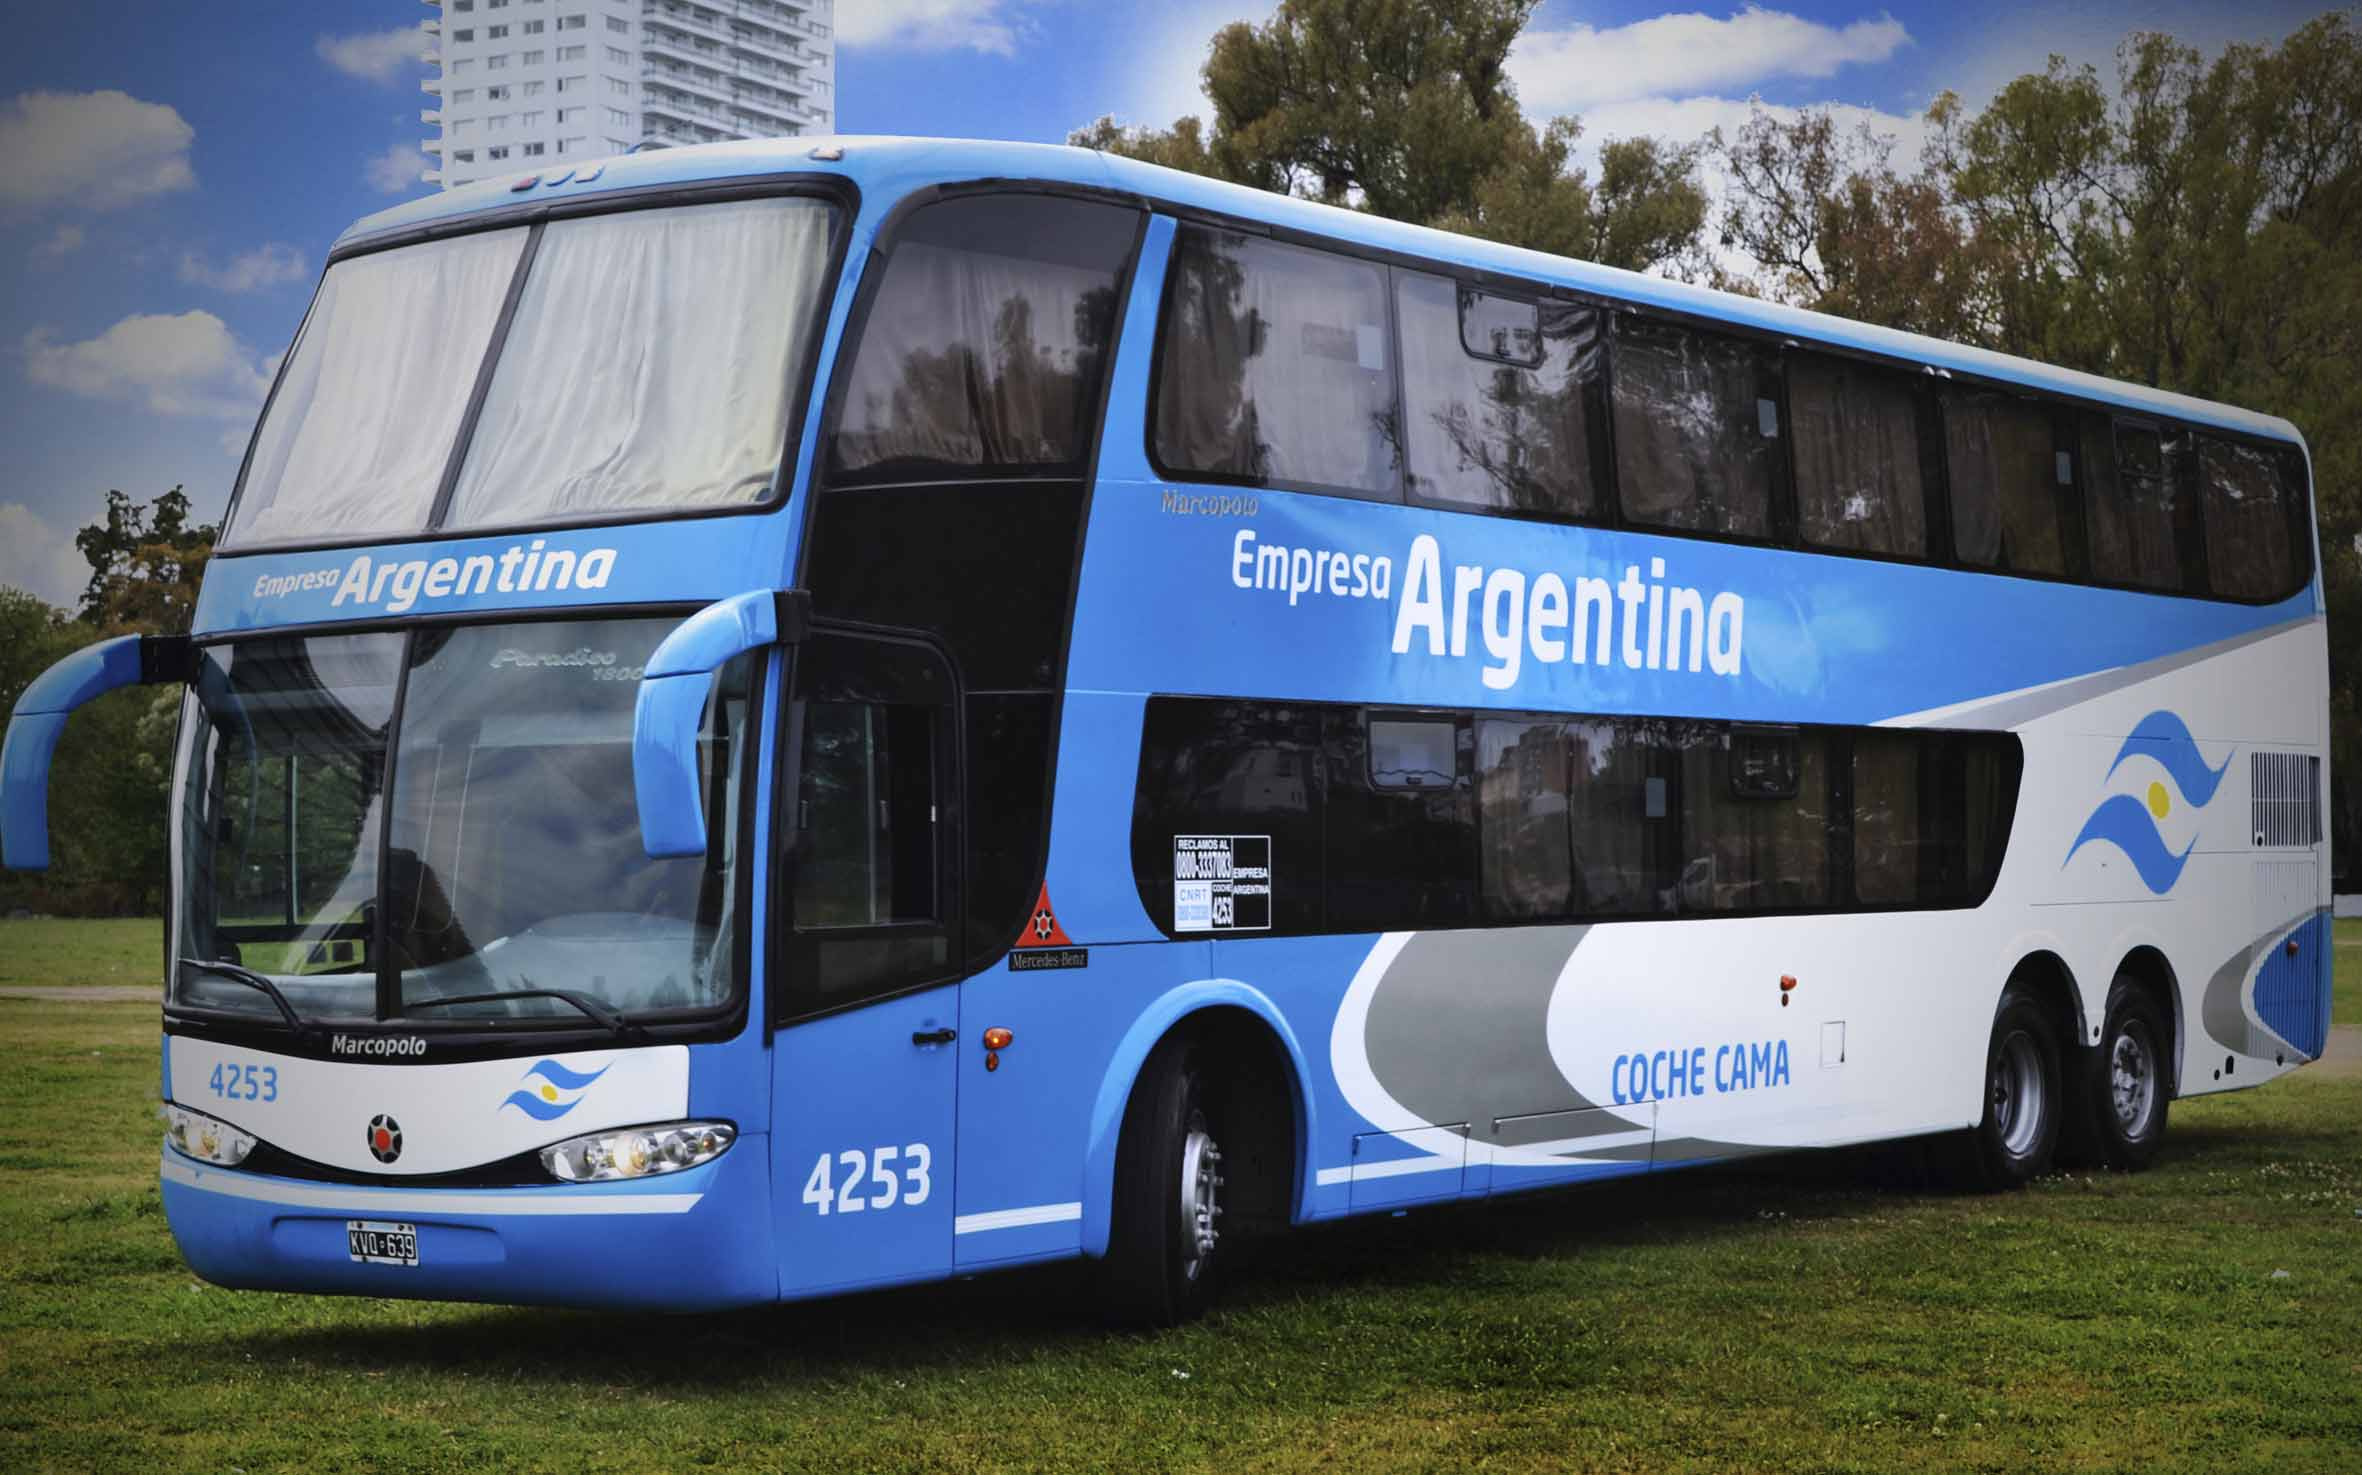 Totum revolutum p gina 311 for Paginas de chimentos argentina